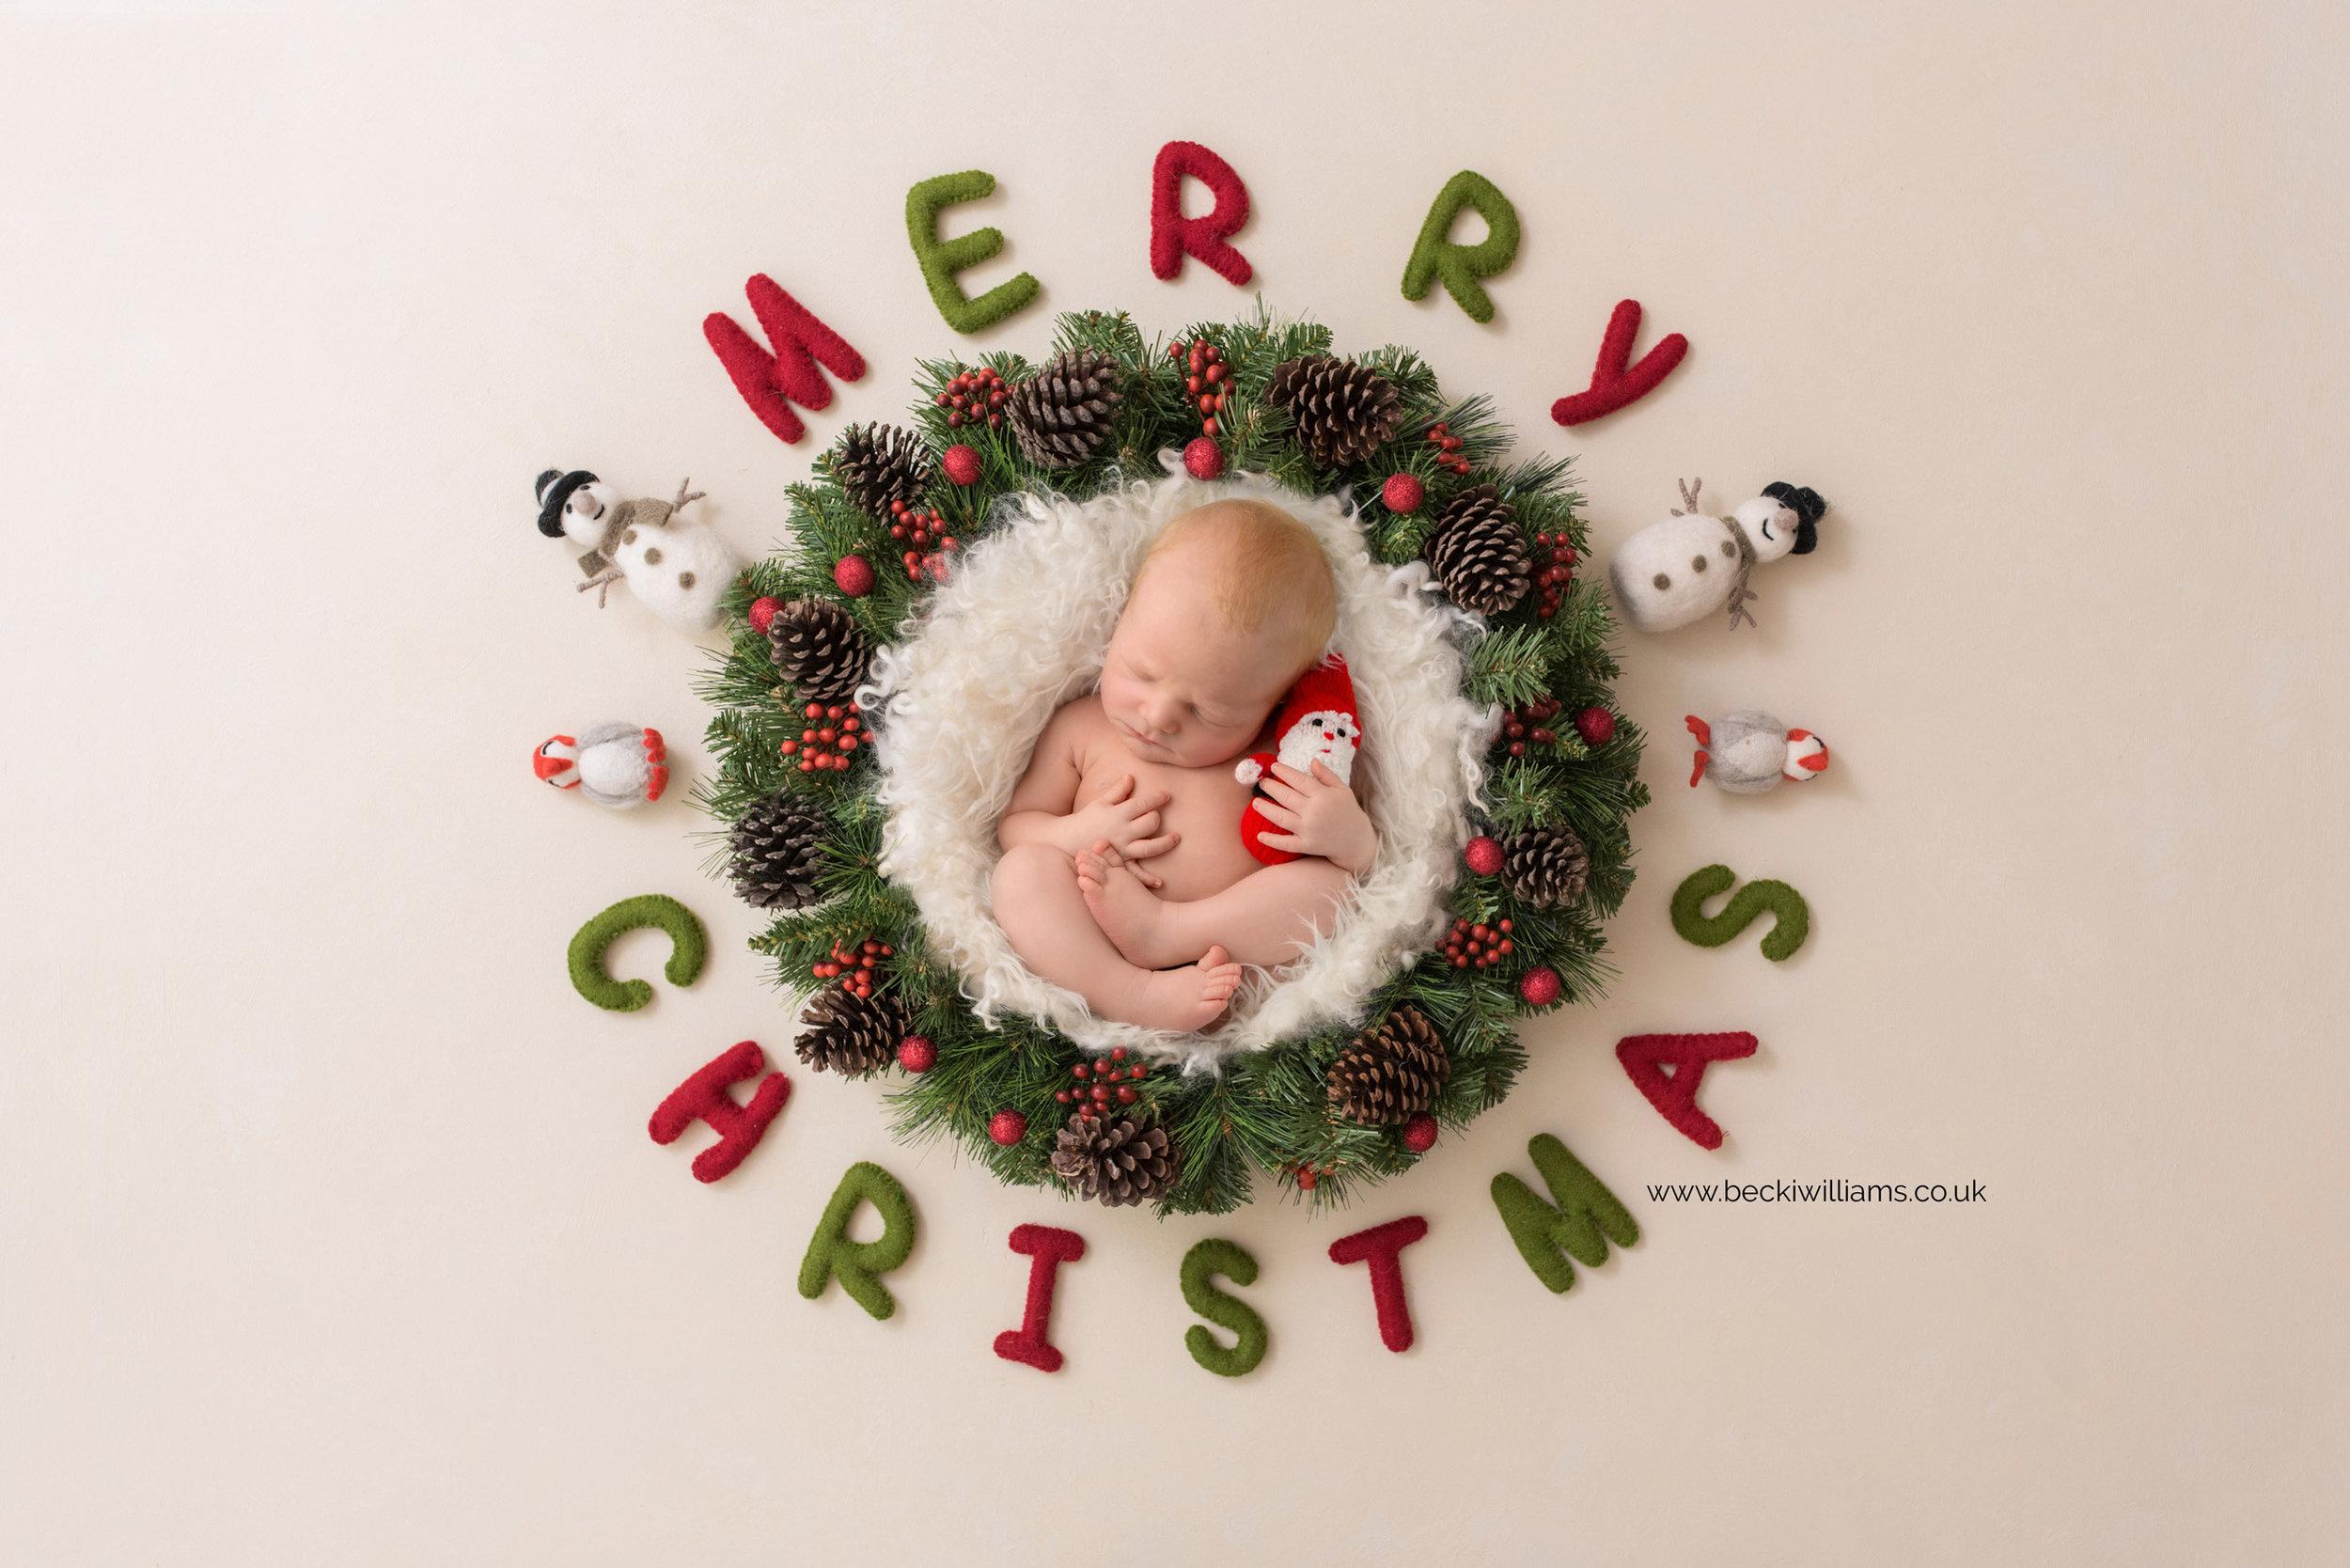 newborn-boy-portraits-hemel-hempstead-christmas-digital-background-merry-christmas2.jpg